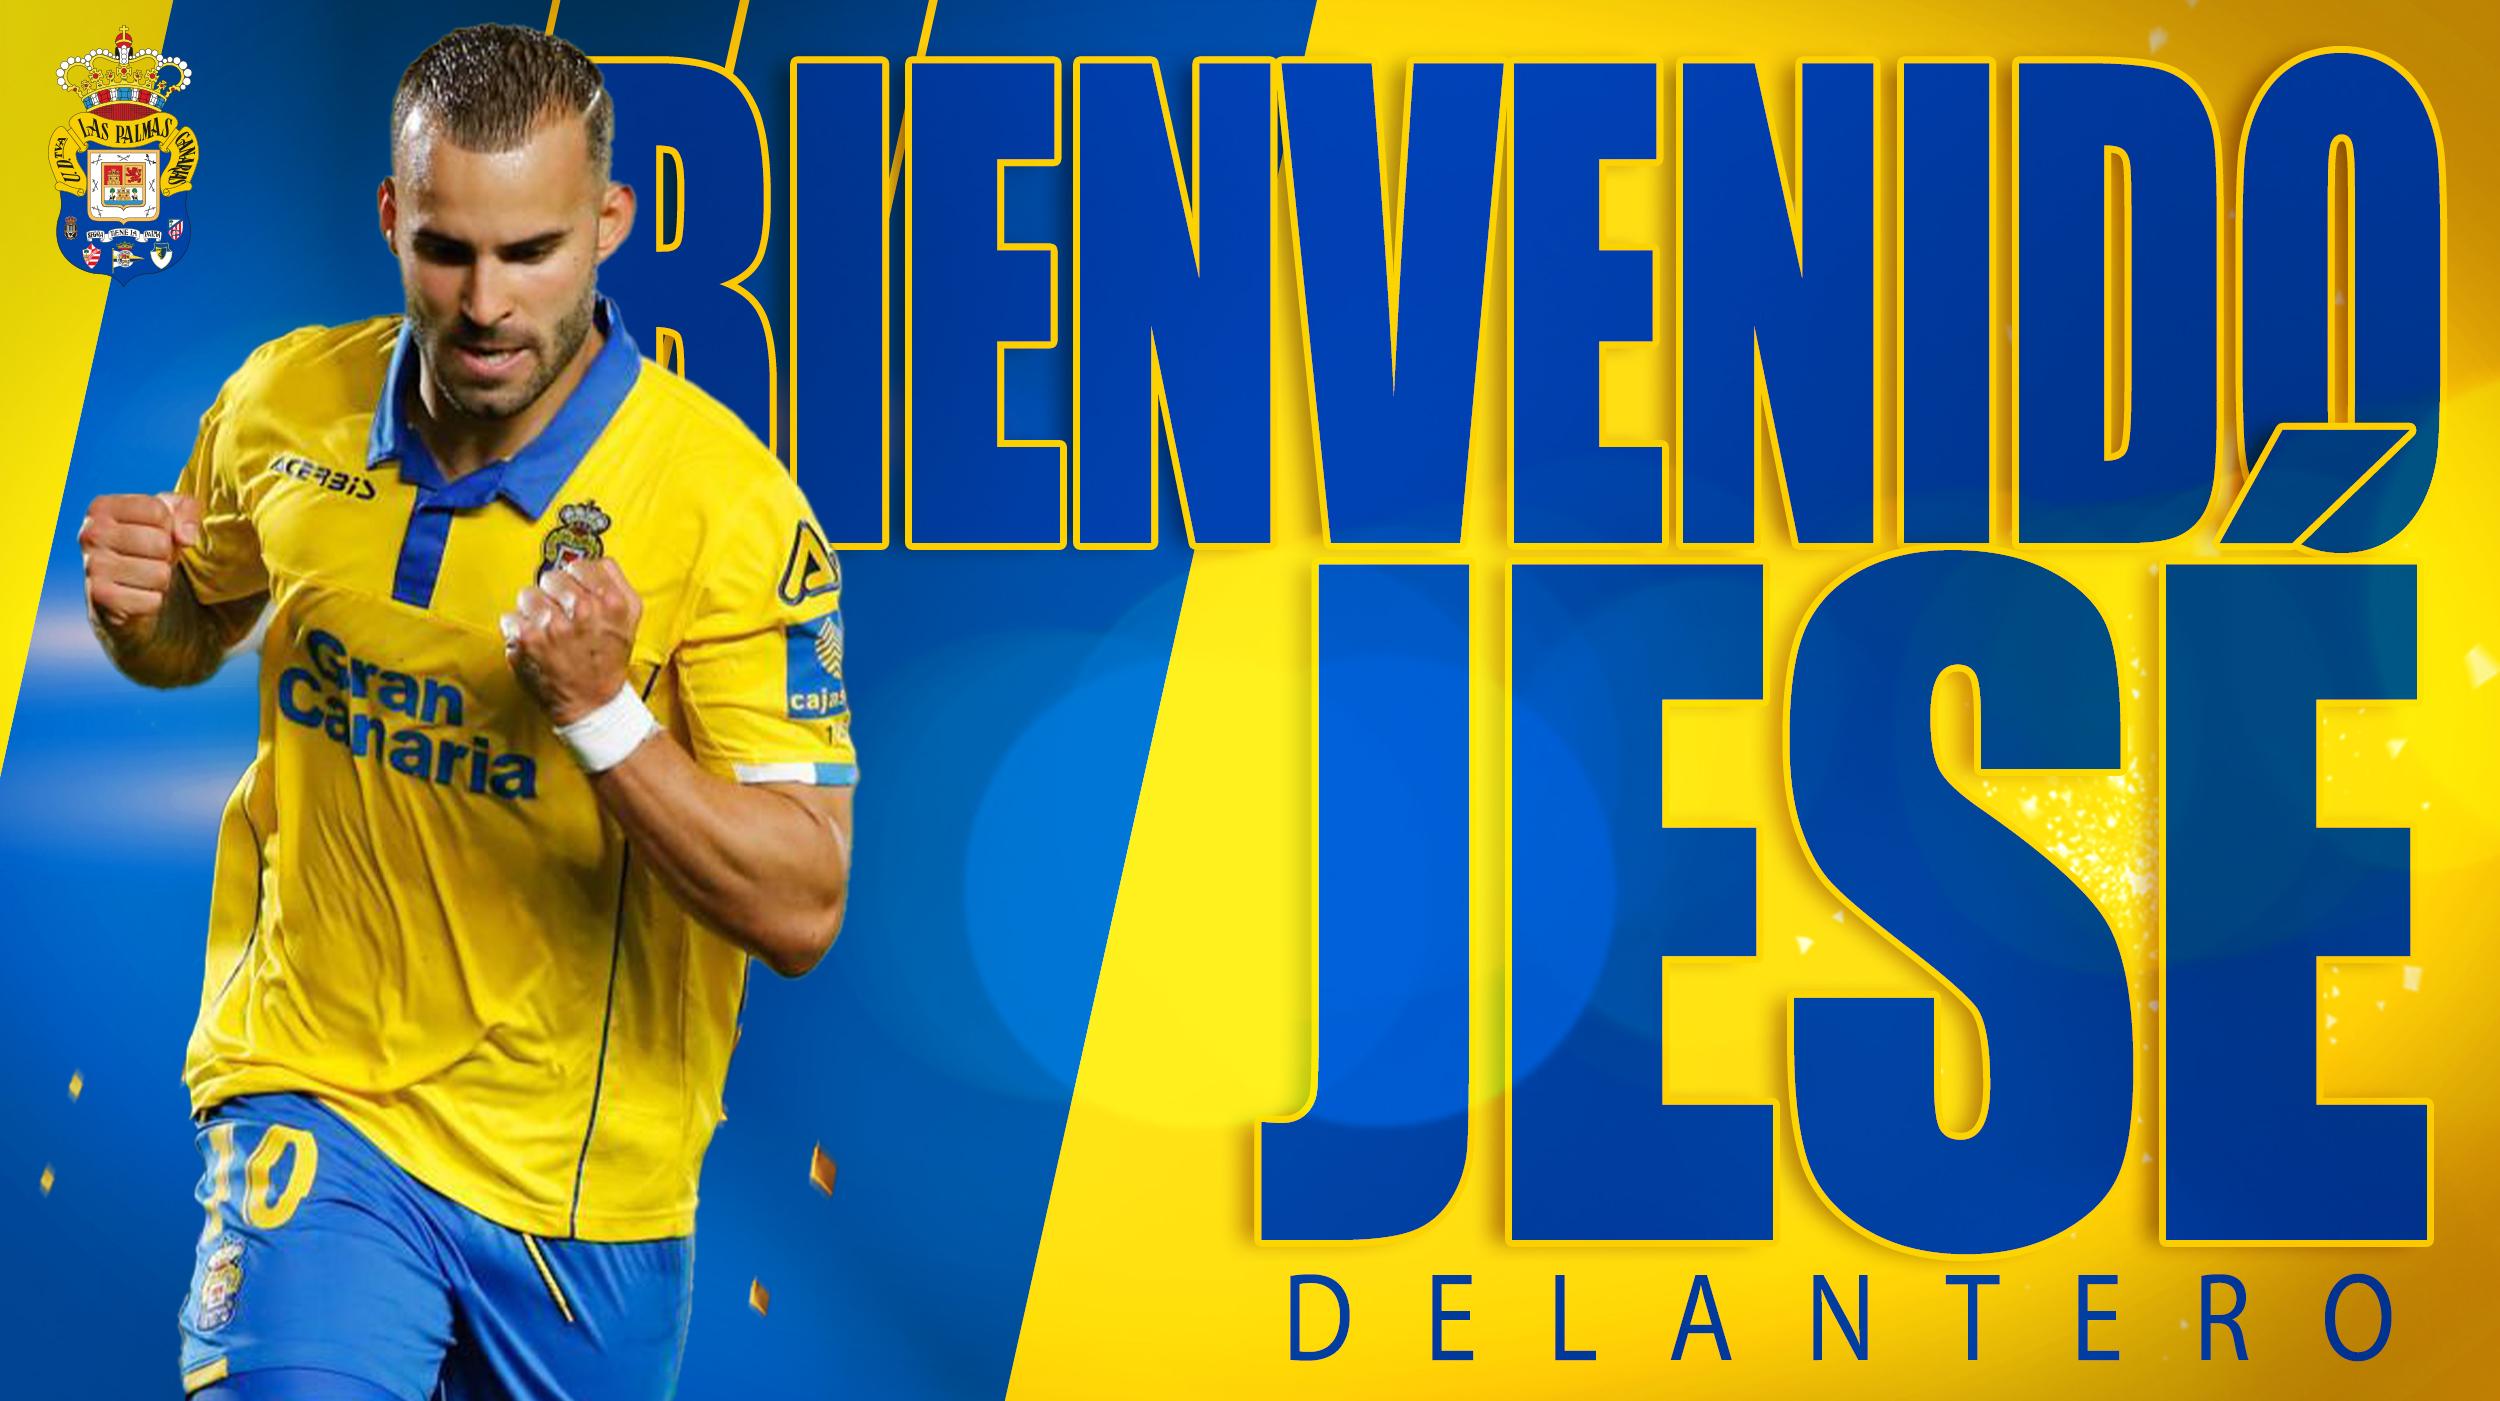 La UD Las Palmas sorprende fichando a Jesé